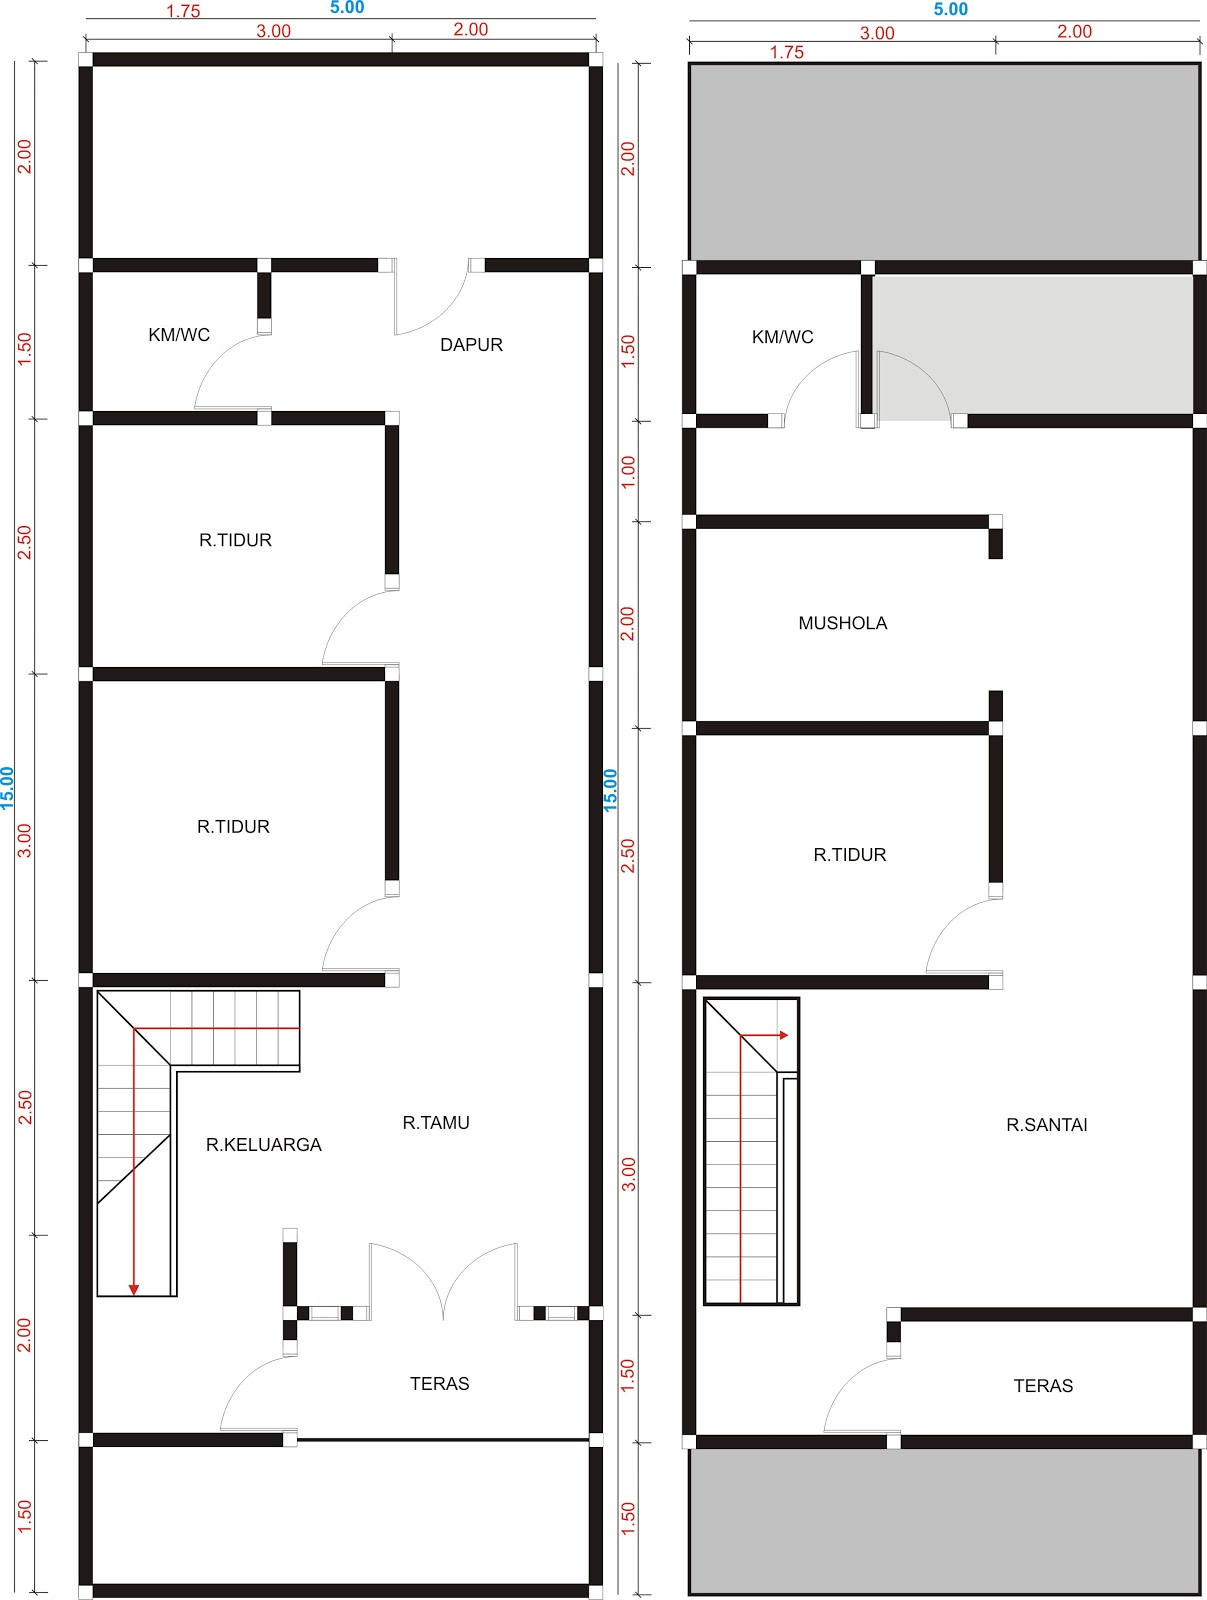 vastusianu rumah dua lantai di lahan 5x15m